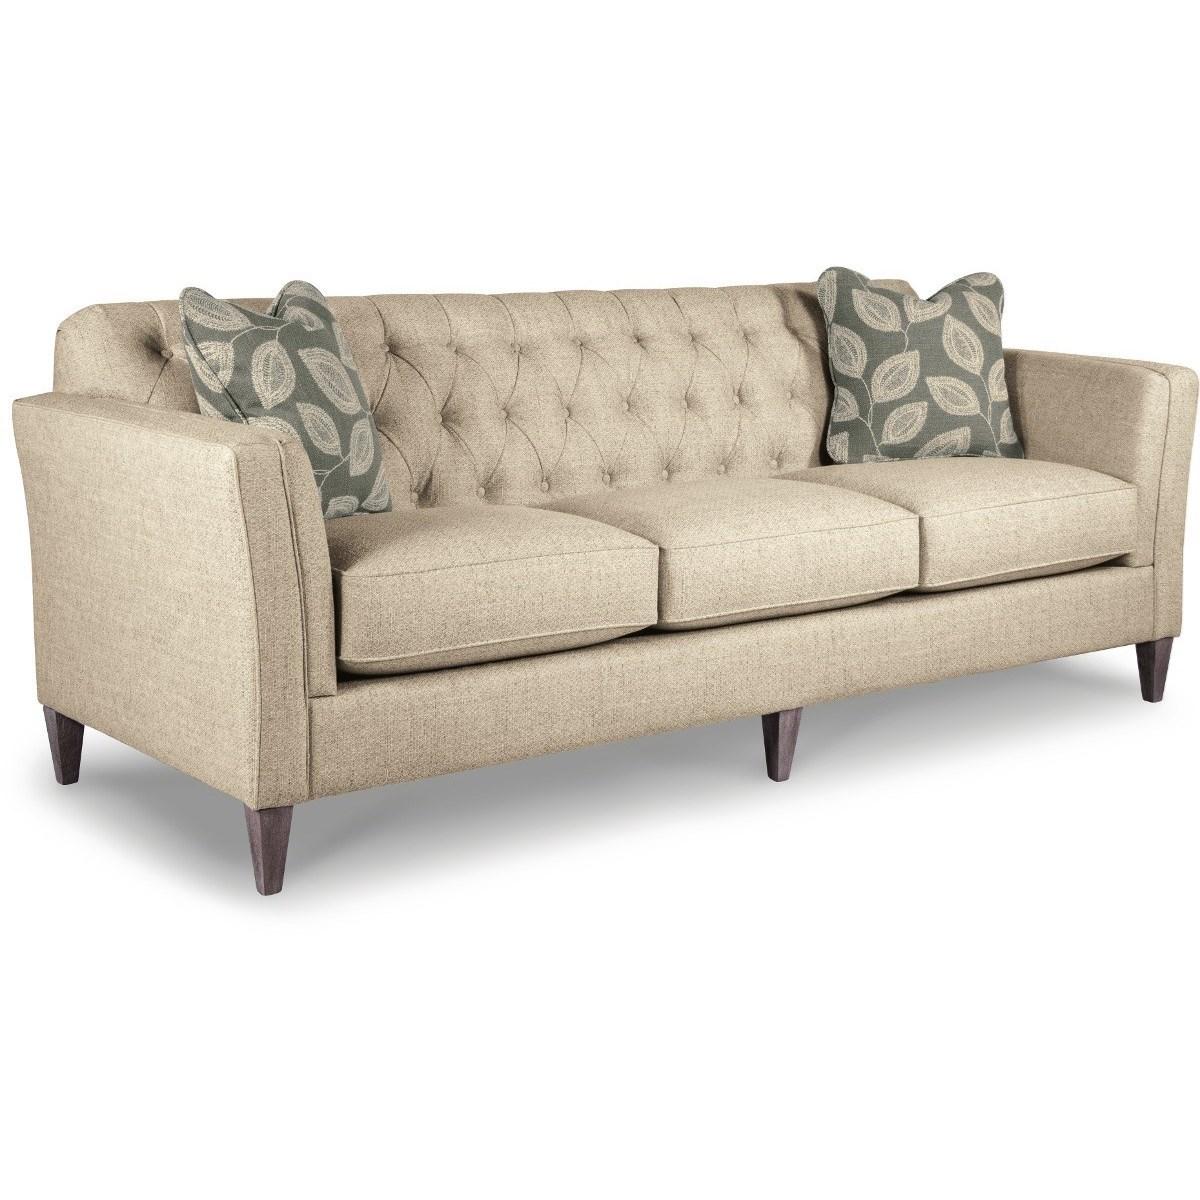 Alexandria Premier Sofa by La-Z-Boy at Houston's Yuma Furniture